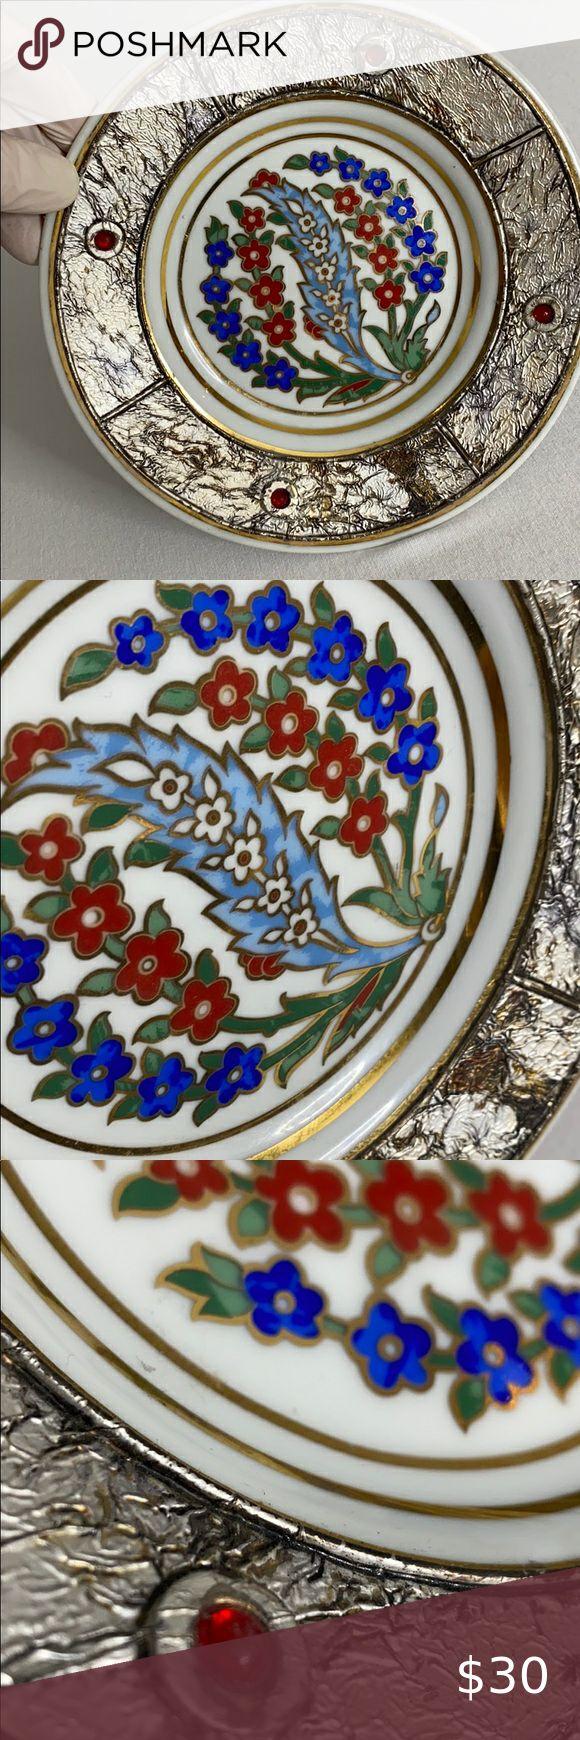 Kutahya Porcelain From Turkey Clothes Design Kutahya Fashion Tips